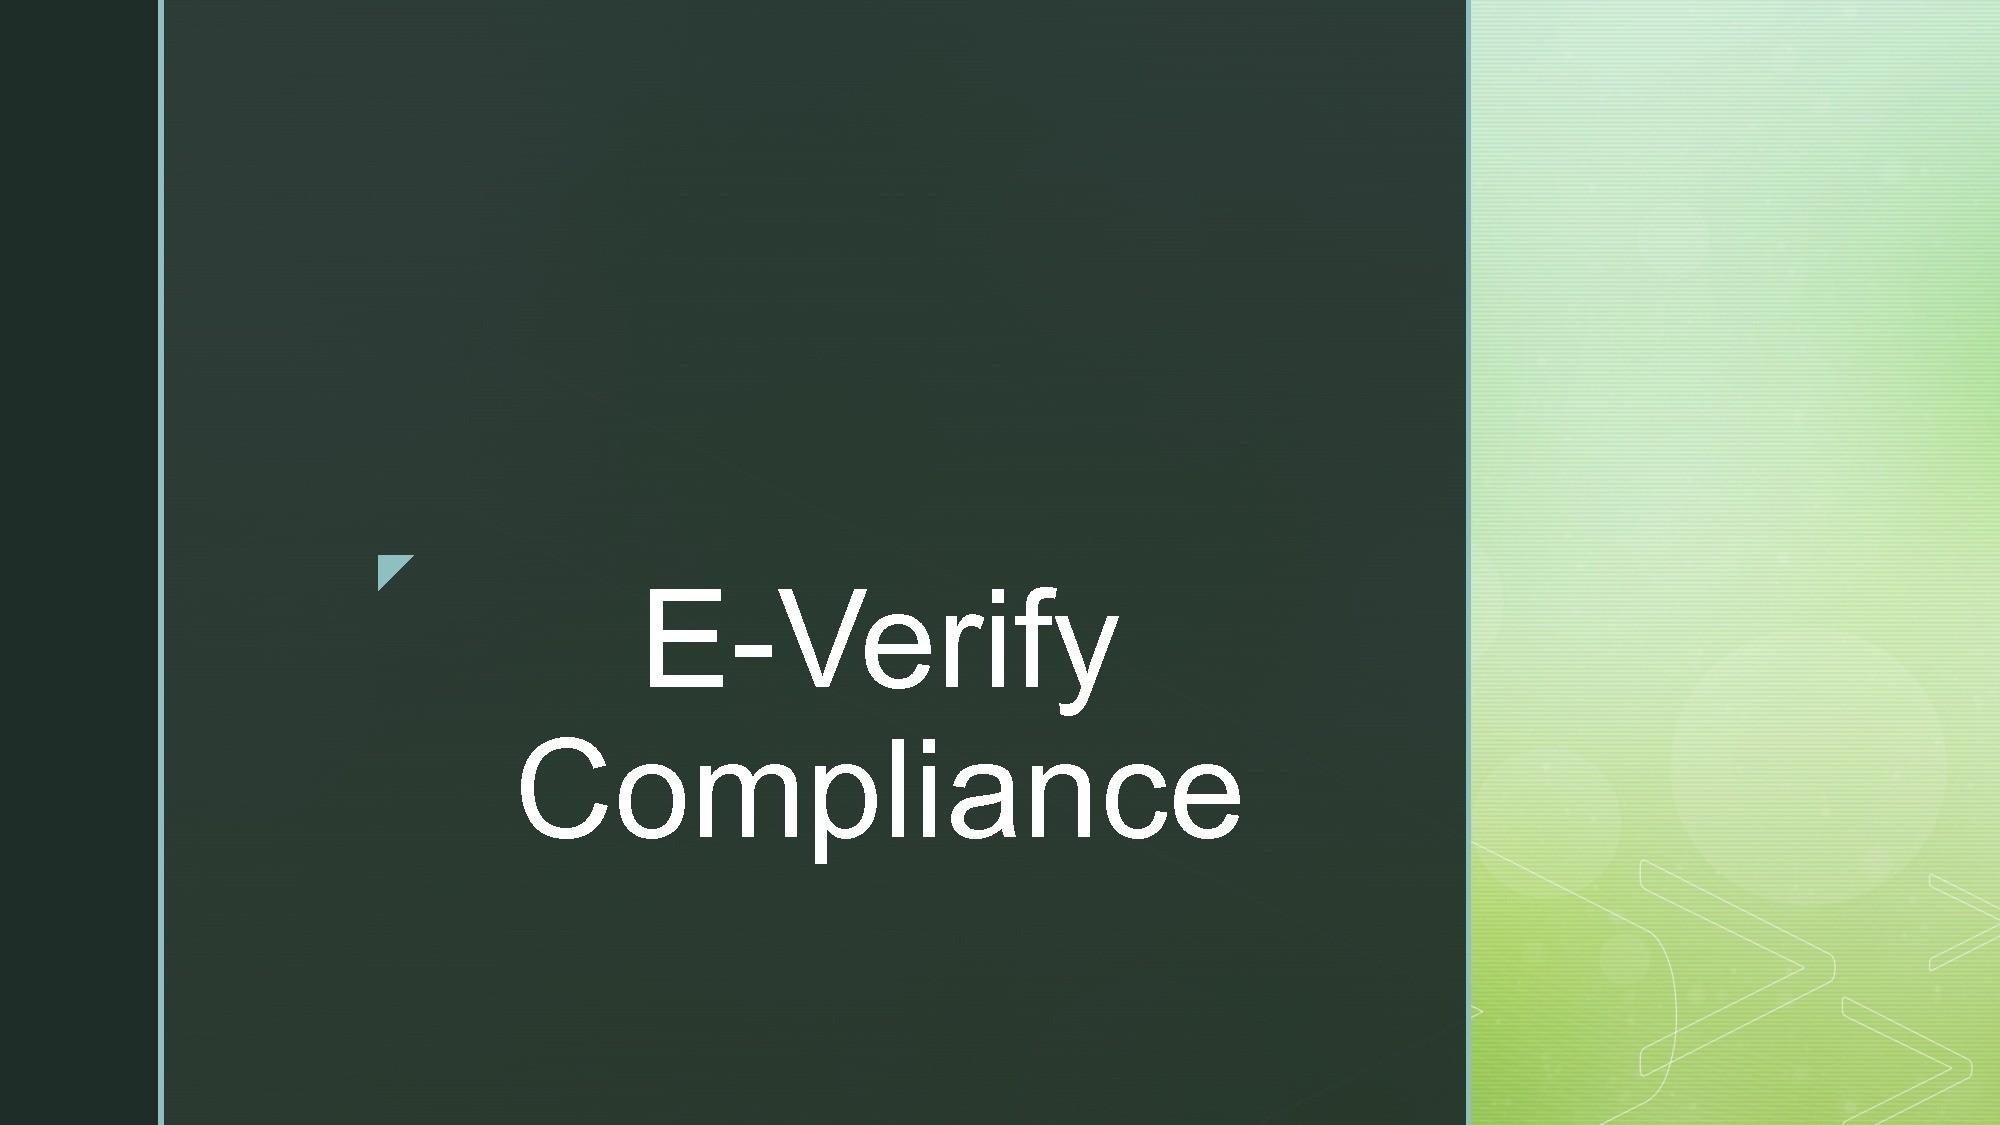 E-Verify Compliance